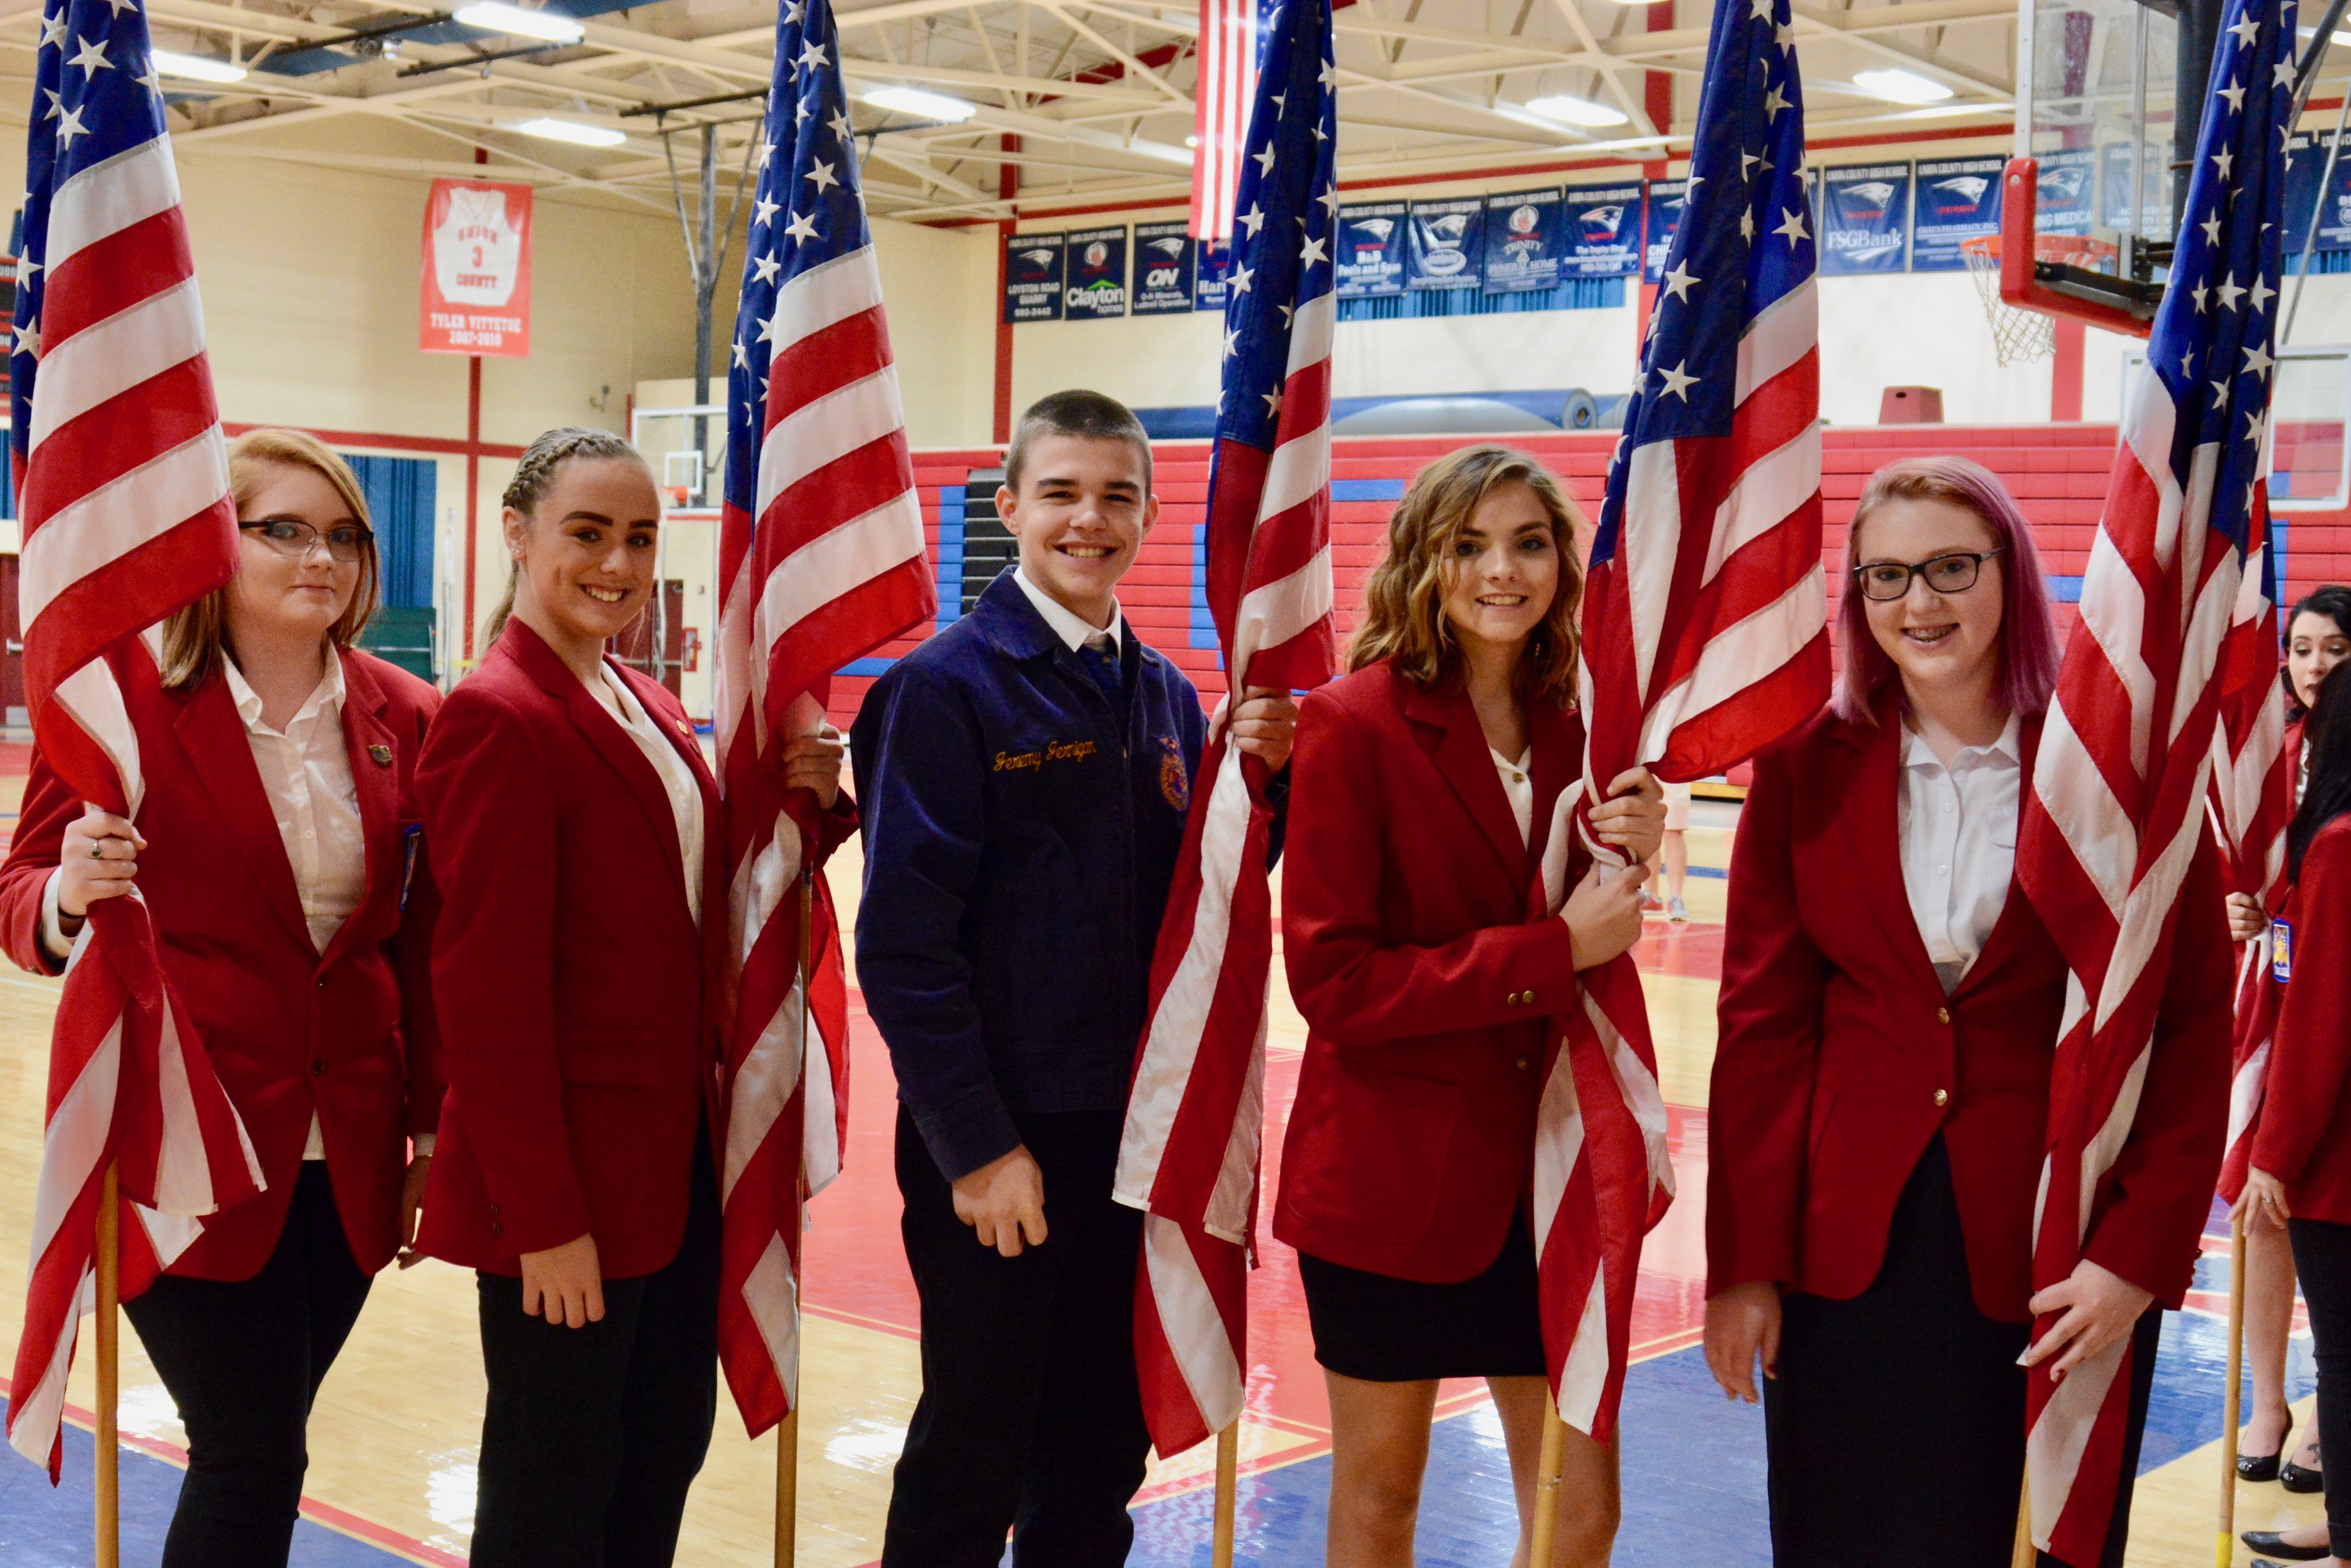 Union County High School Celebrates Veterans Day